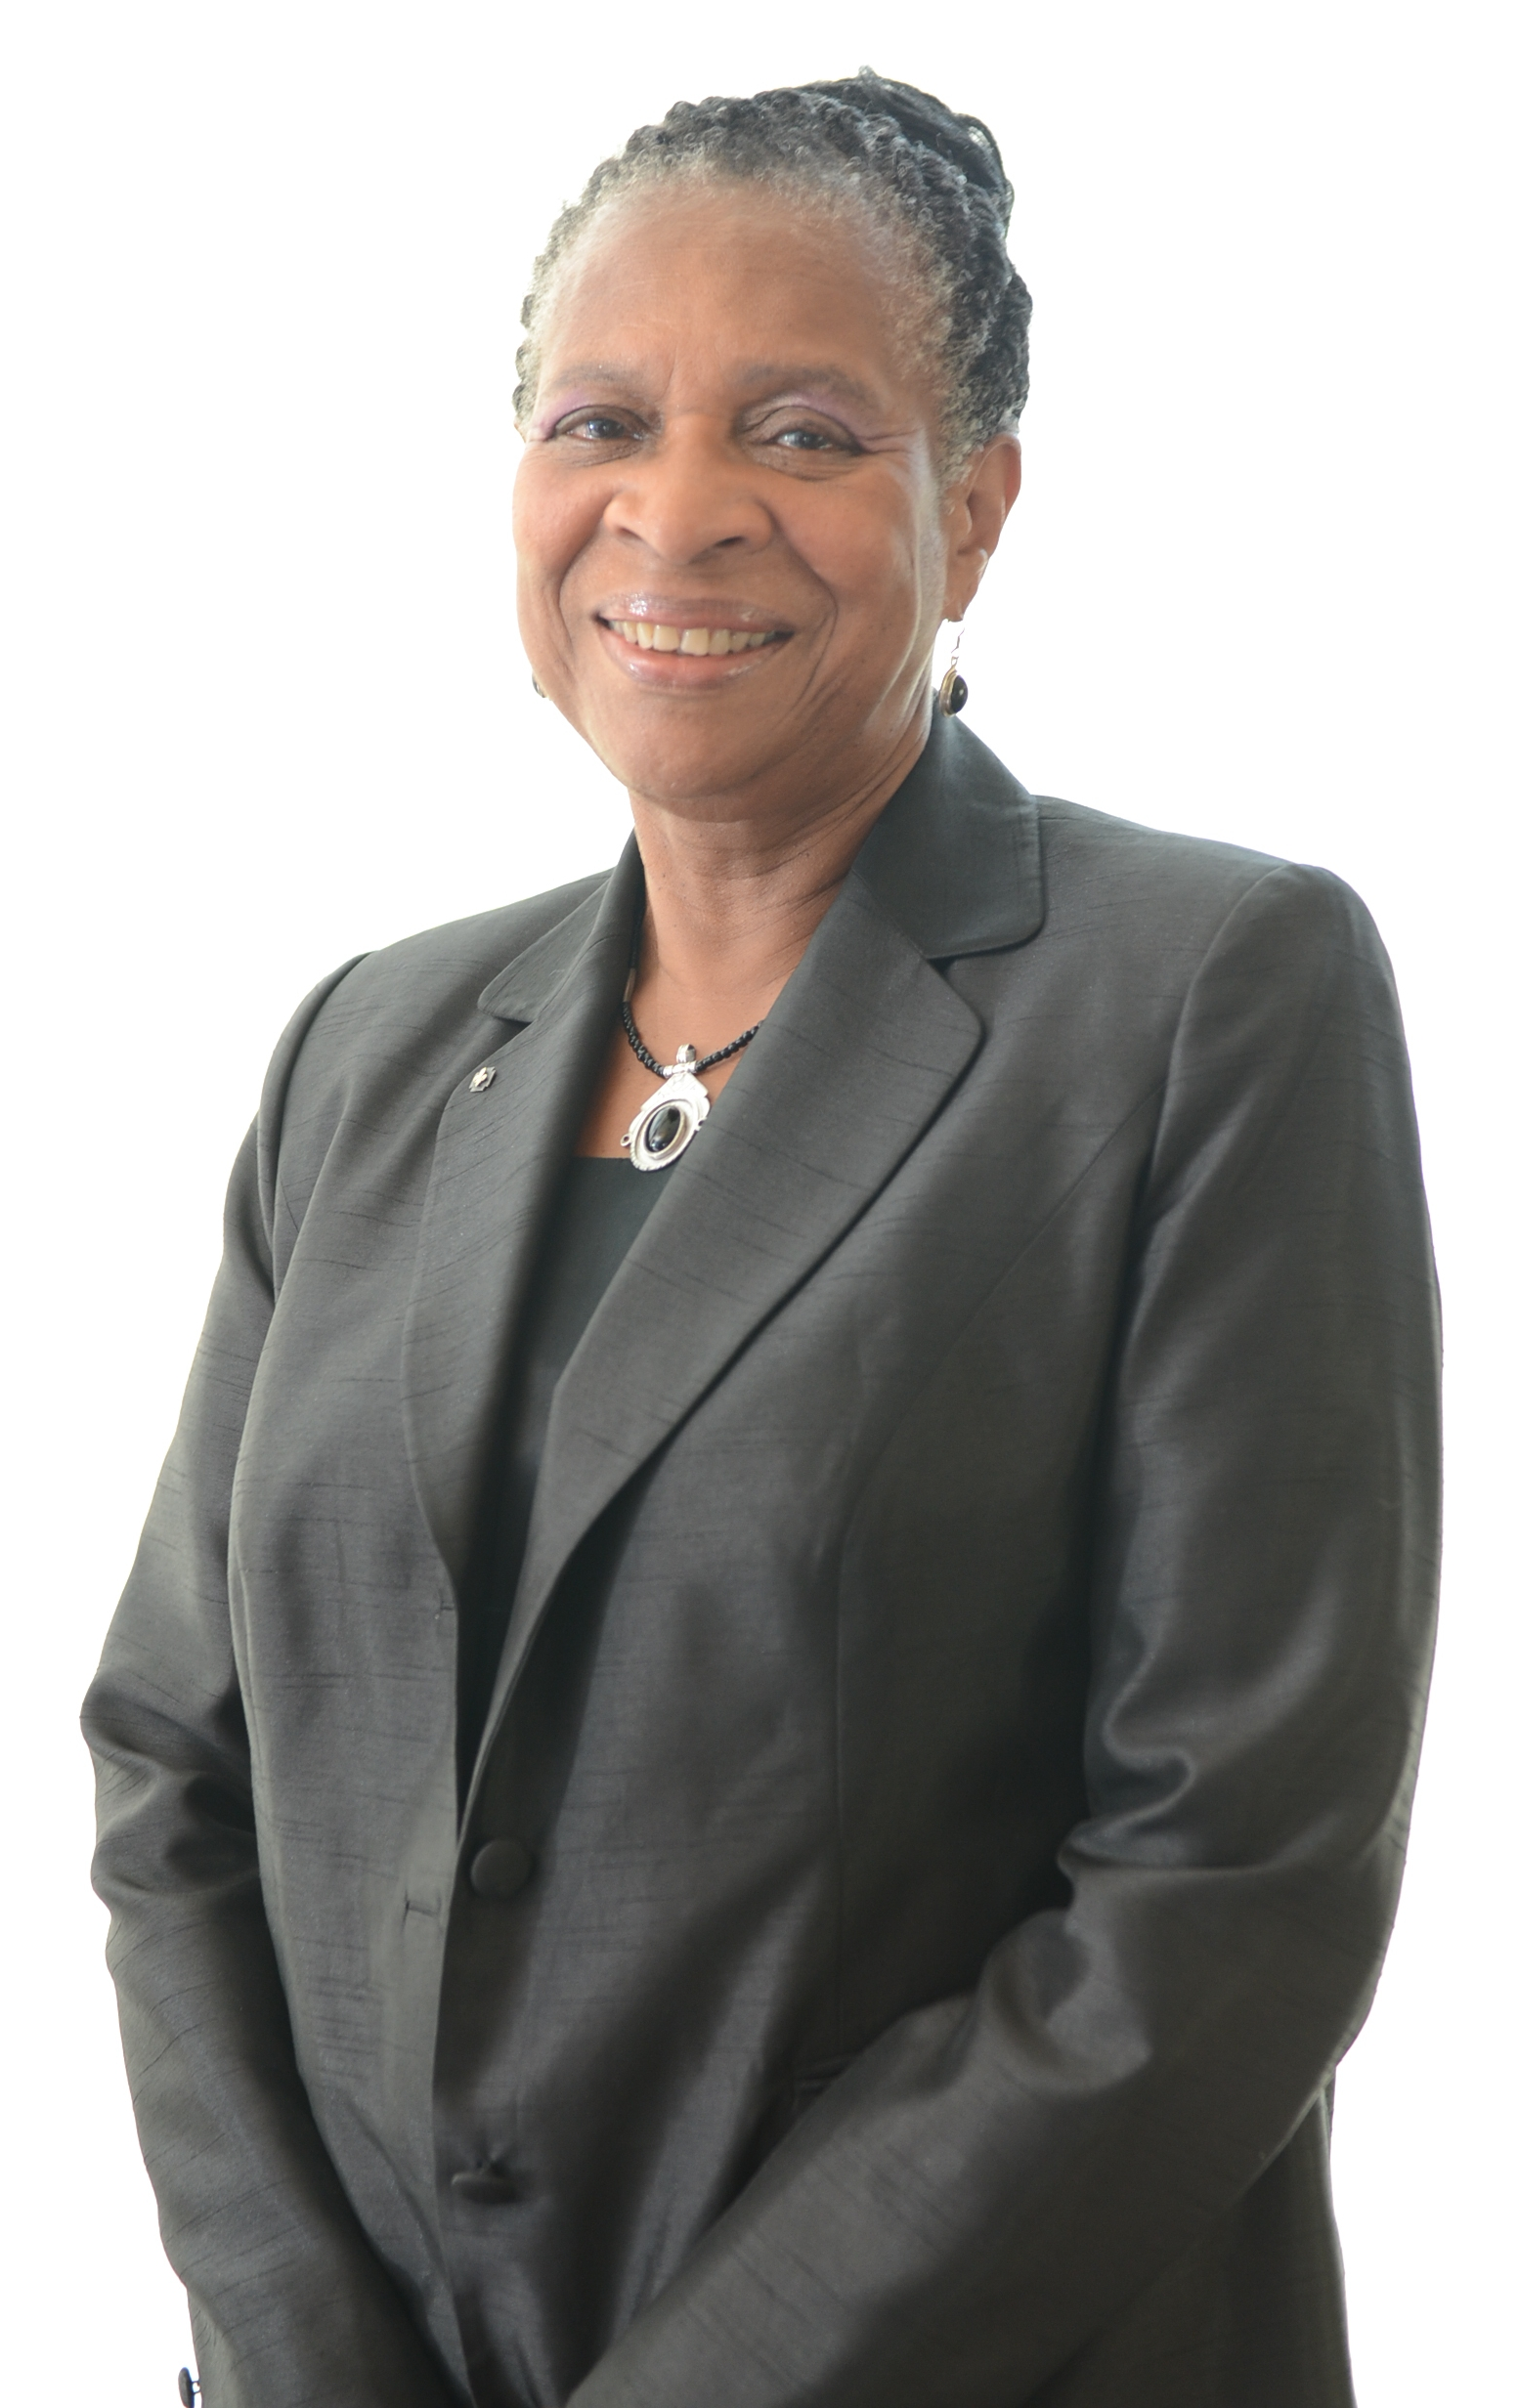 Juanita Westmoreland-Traore